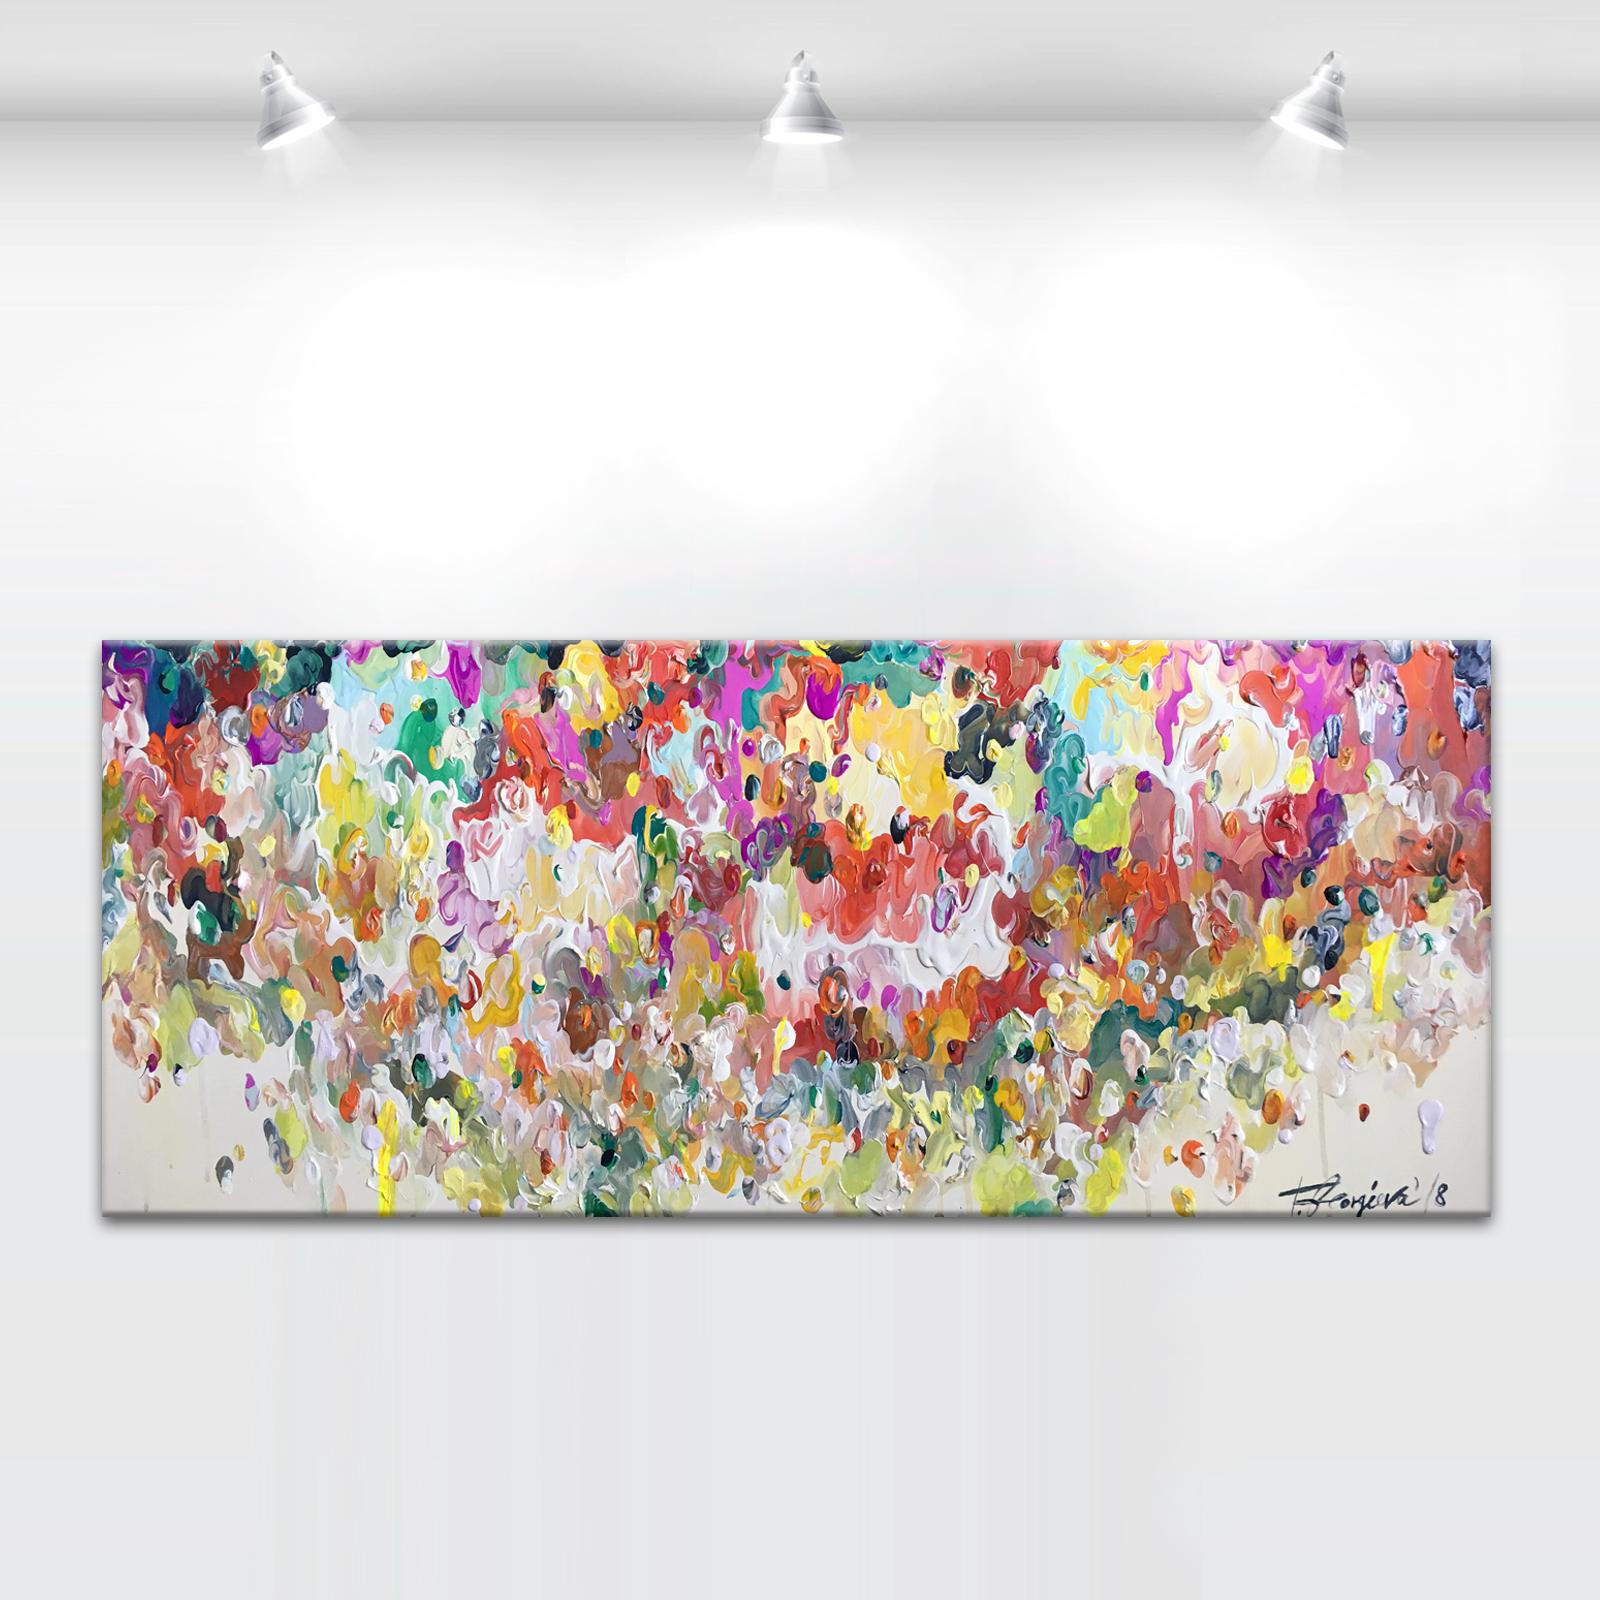 abstract-173_wall